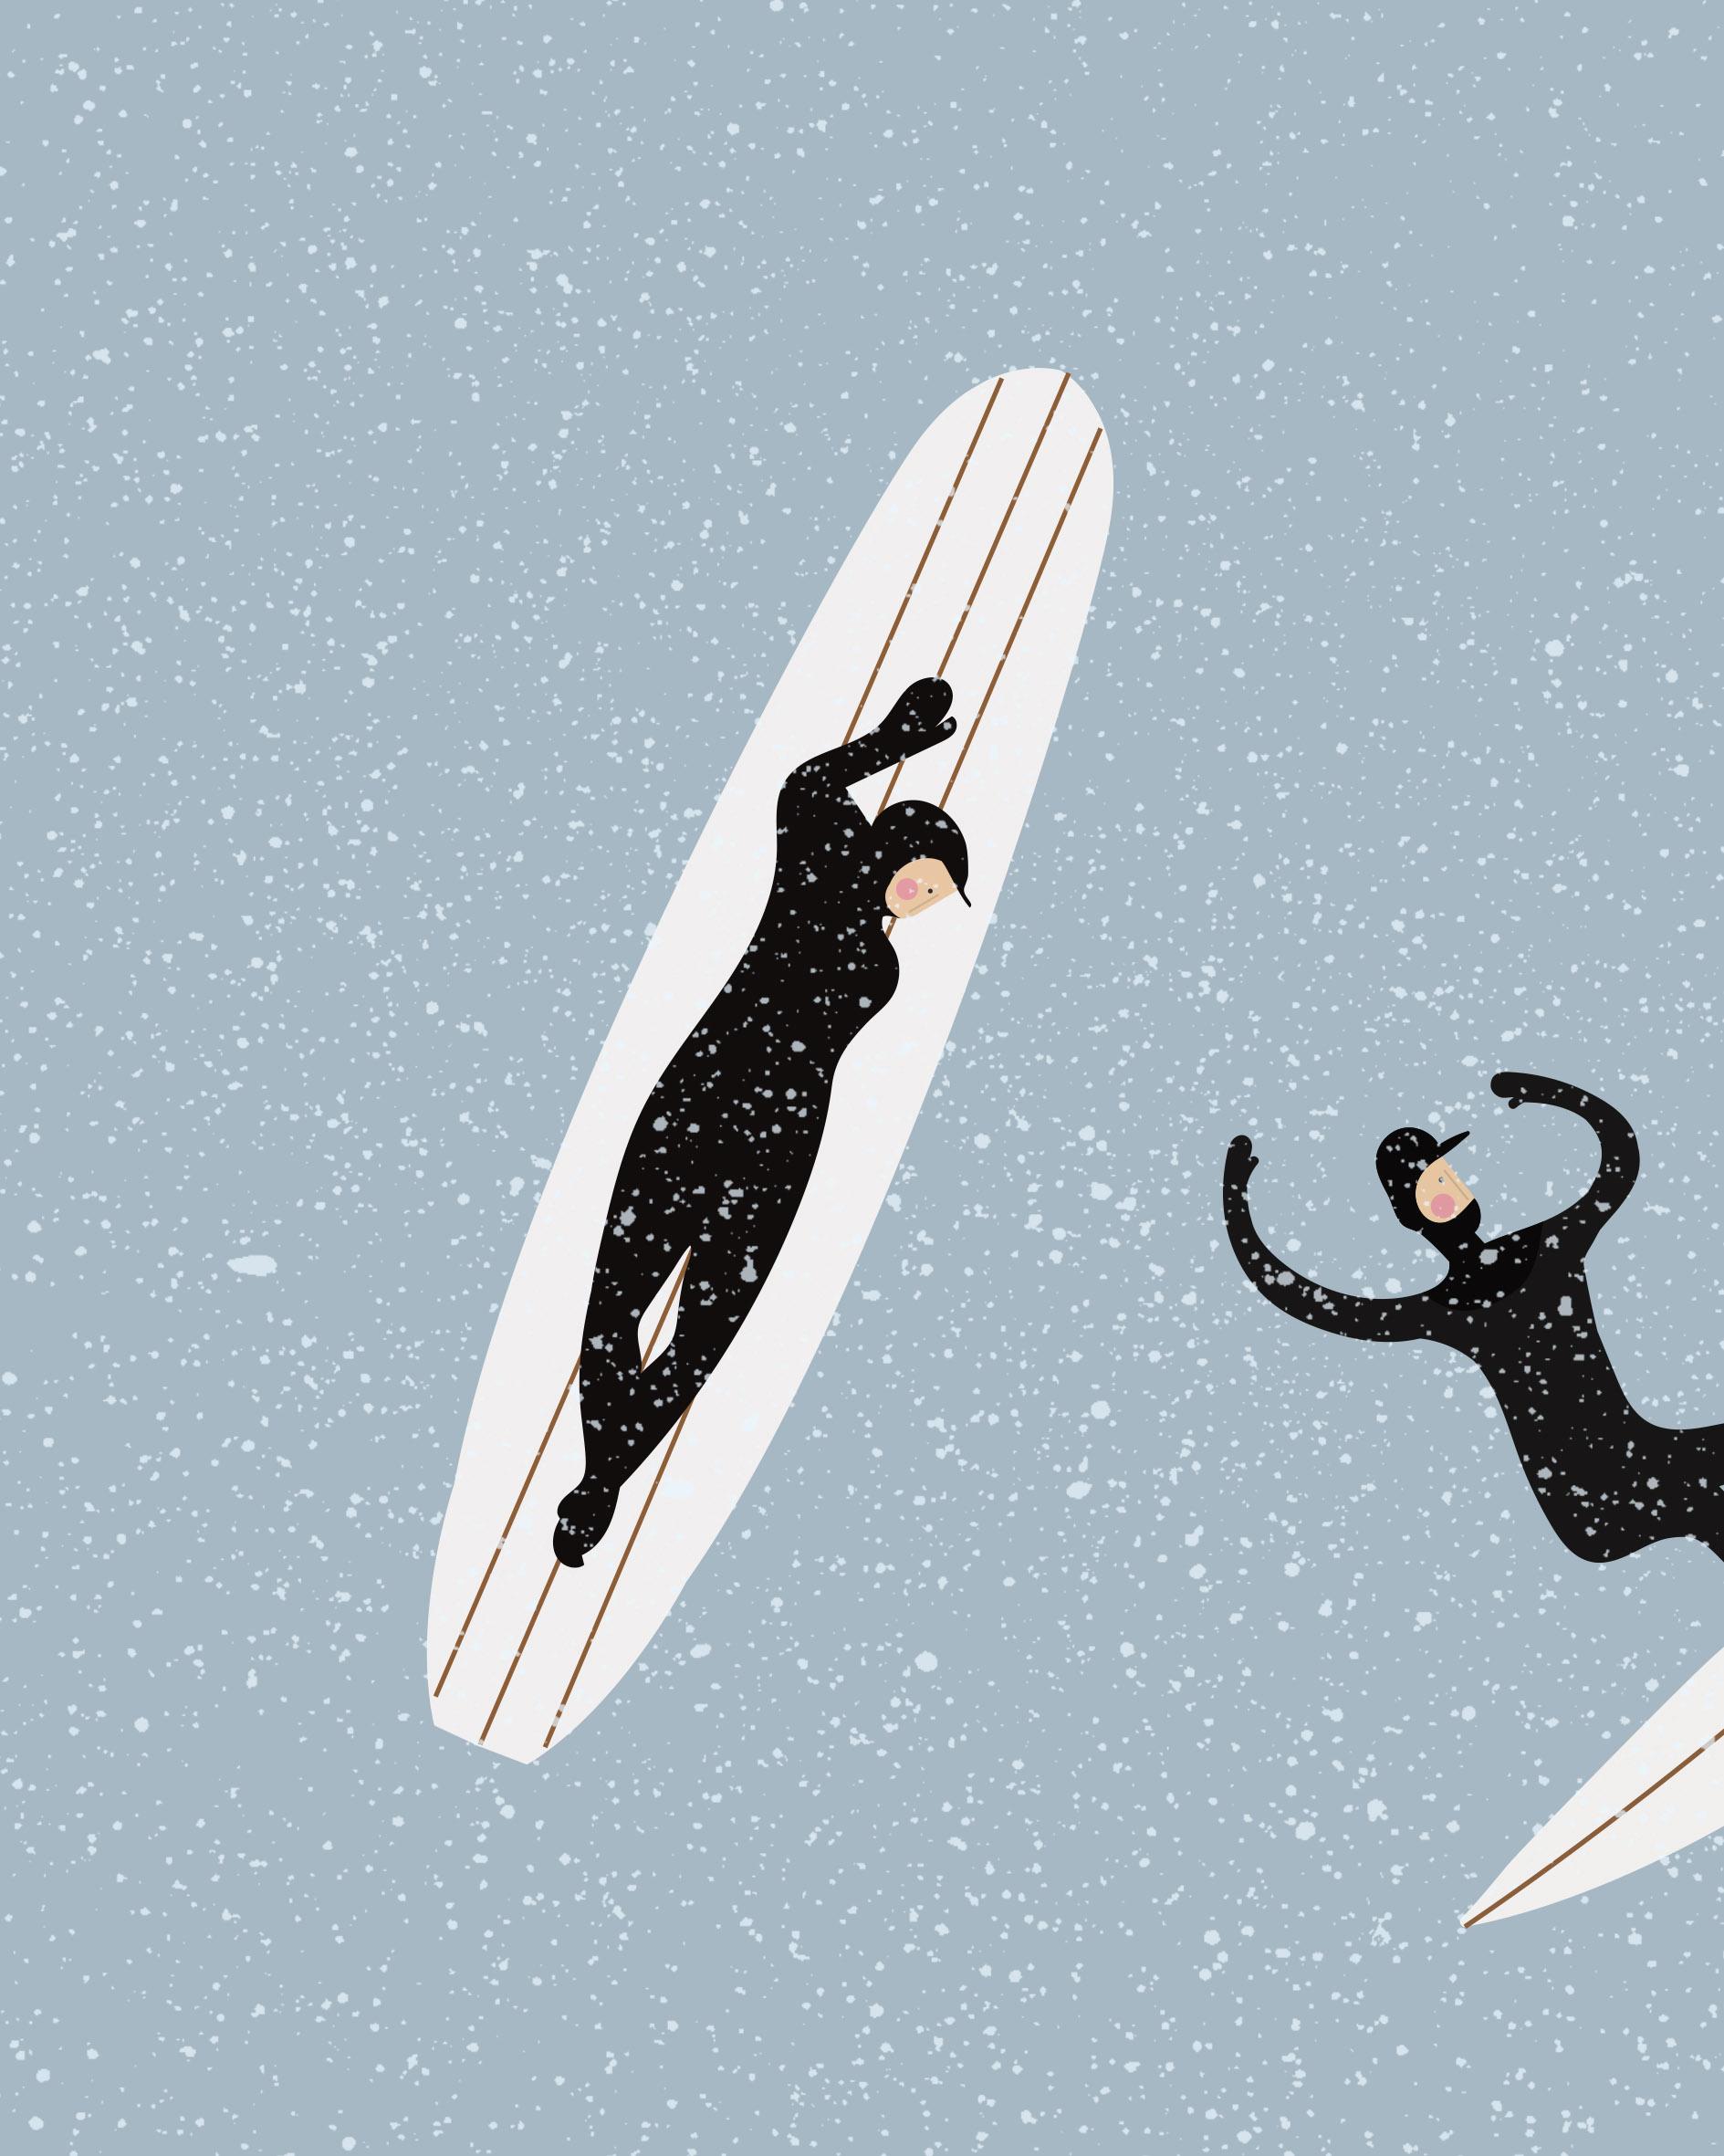 six_foot_four_studio_carlos_rollan_surf_norway_1 copia.jpg